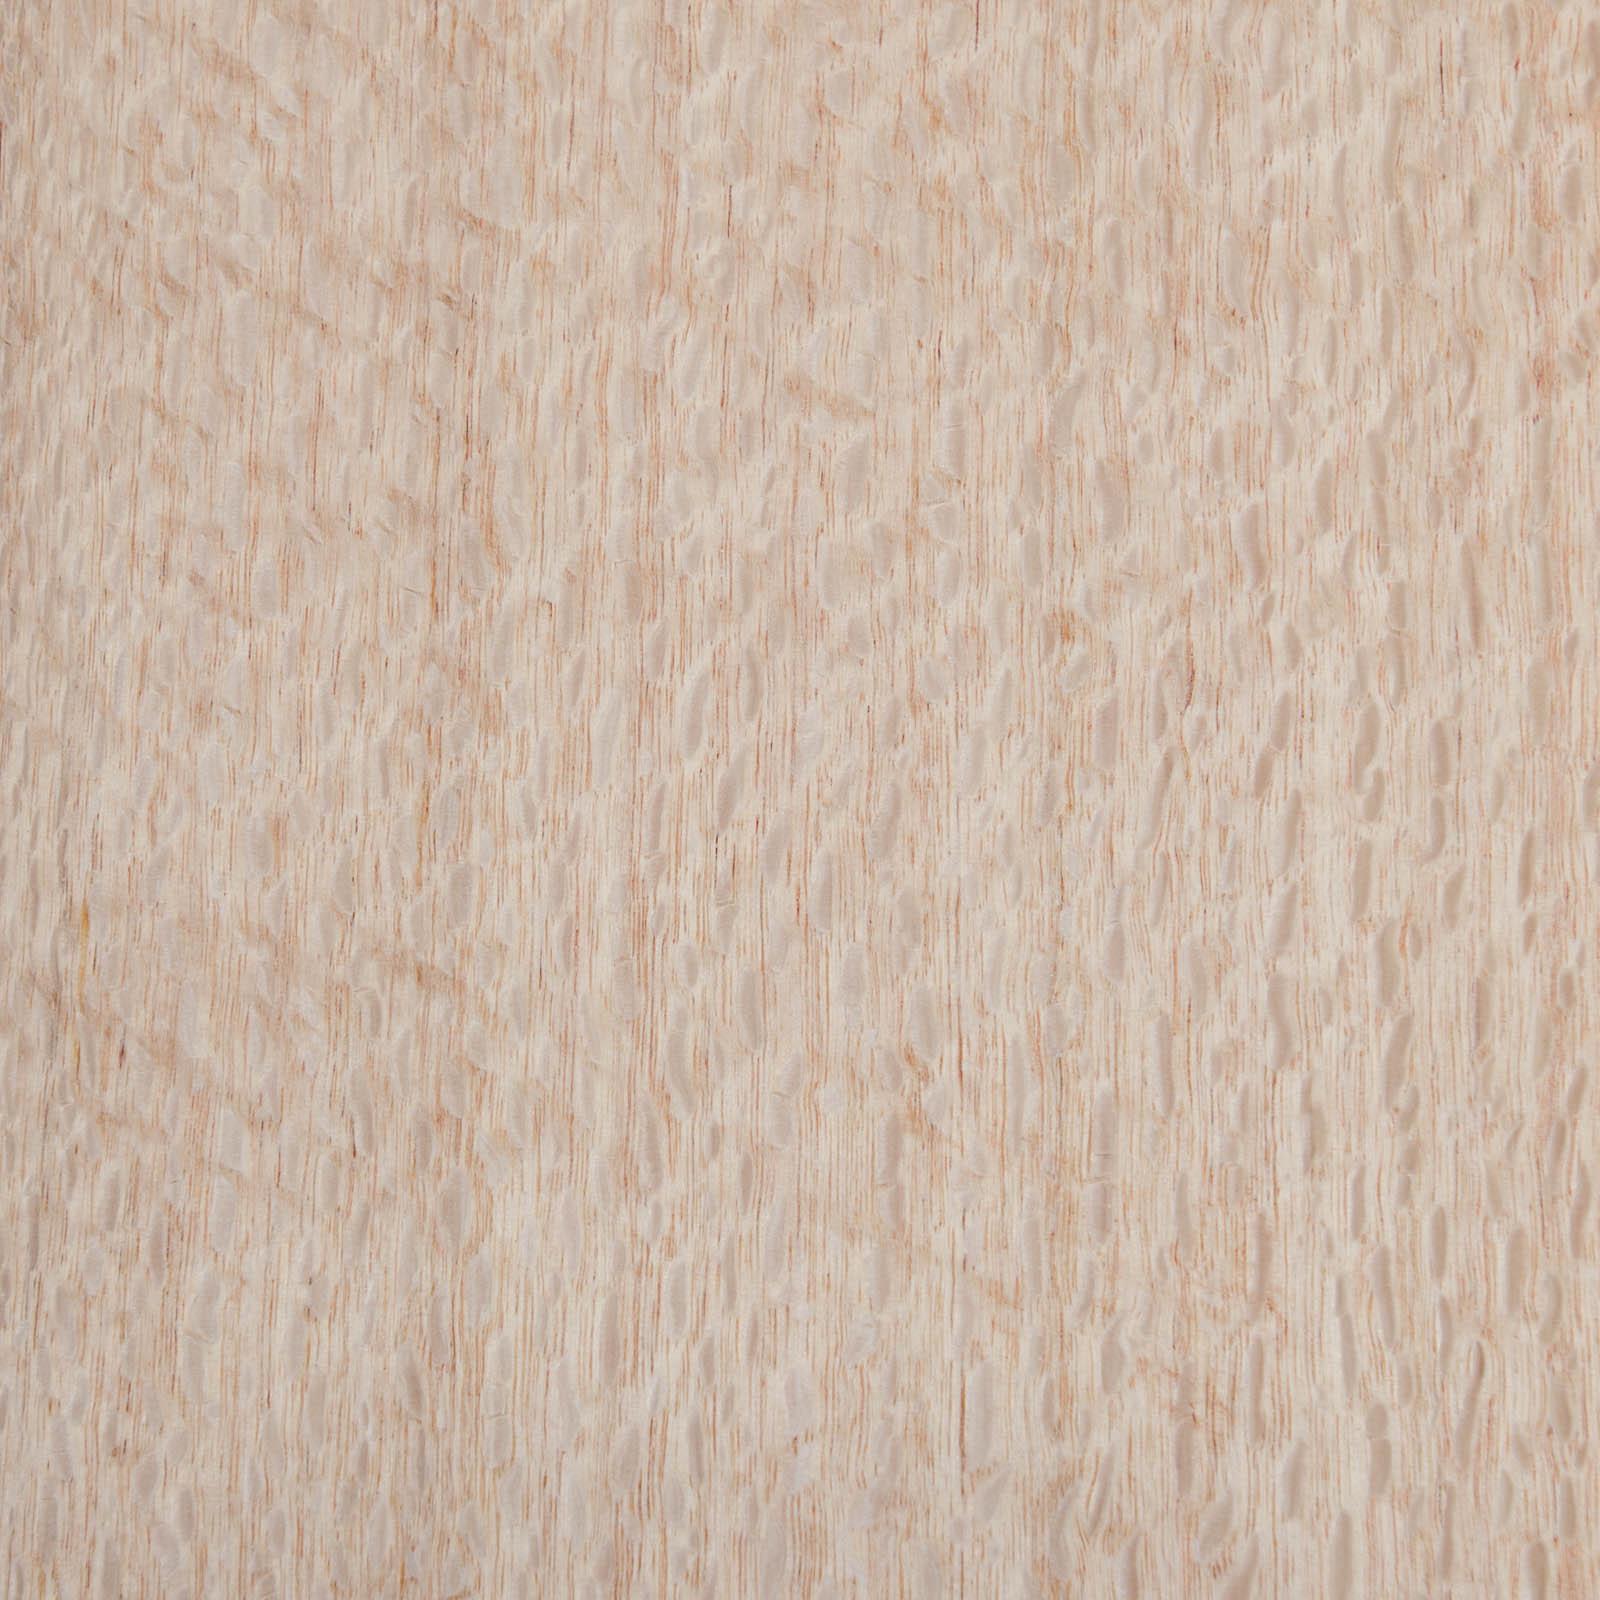 Silky Oak 174cm X 18cm – 2 sheets Wood Veneer   eBay